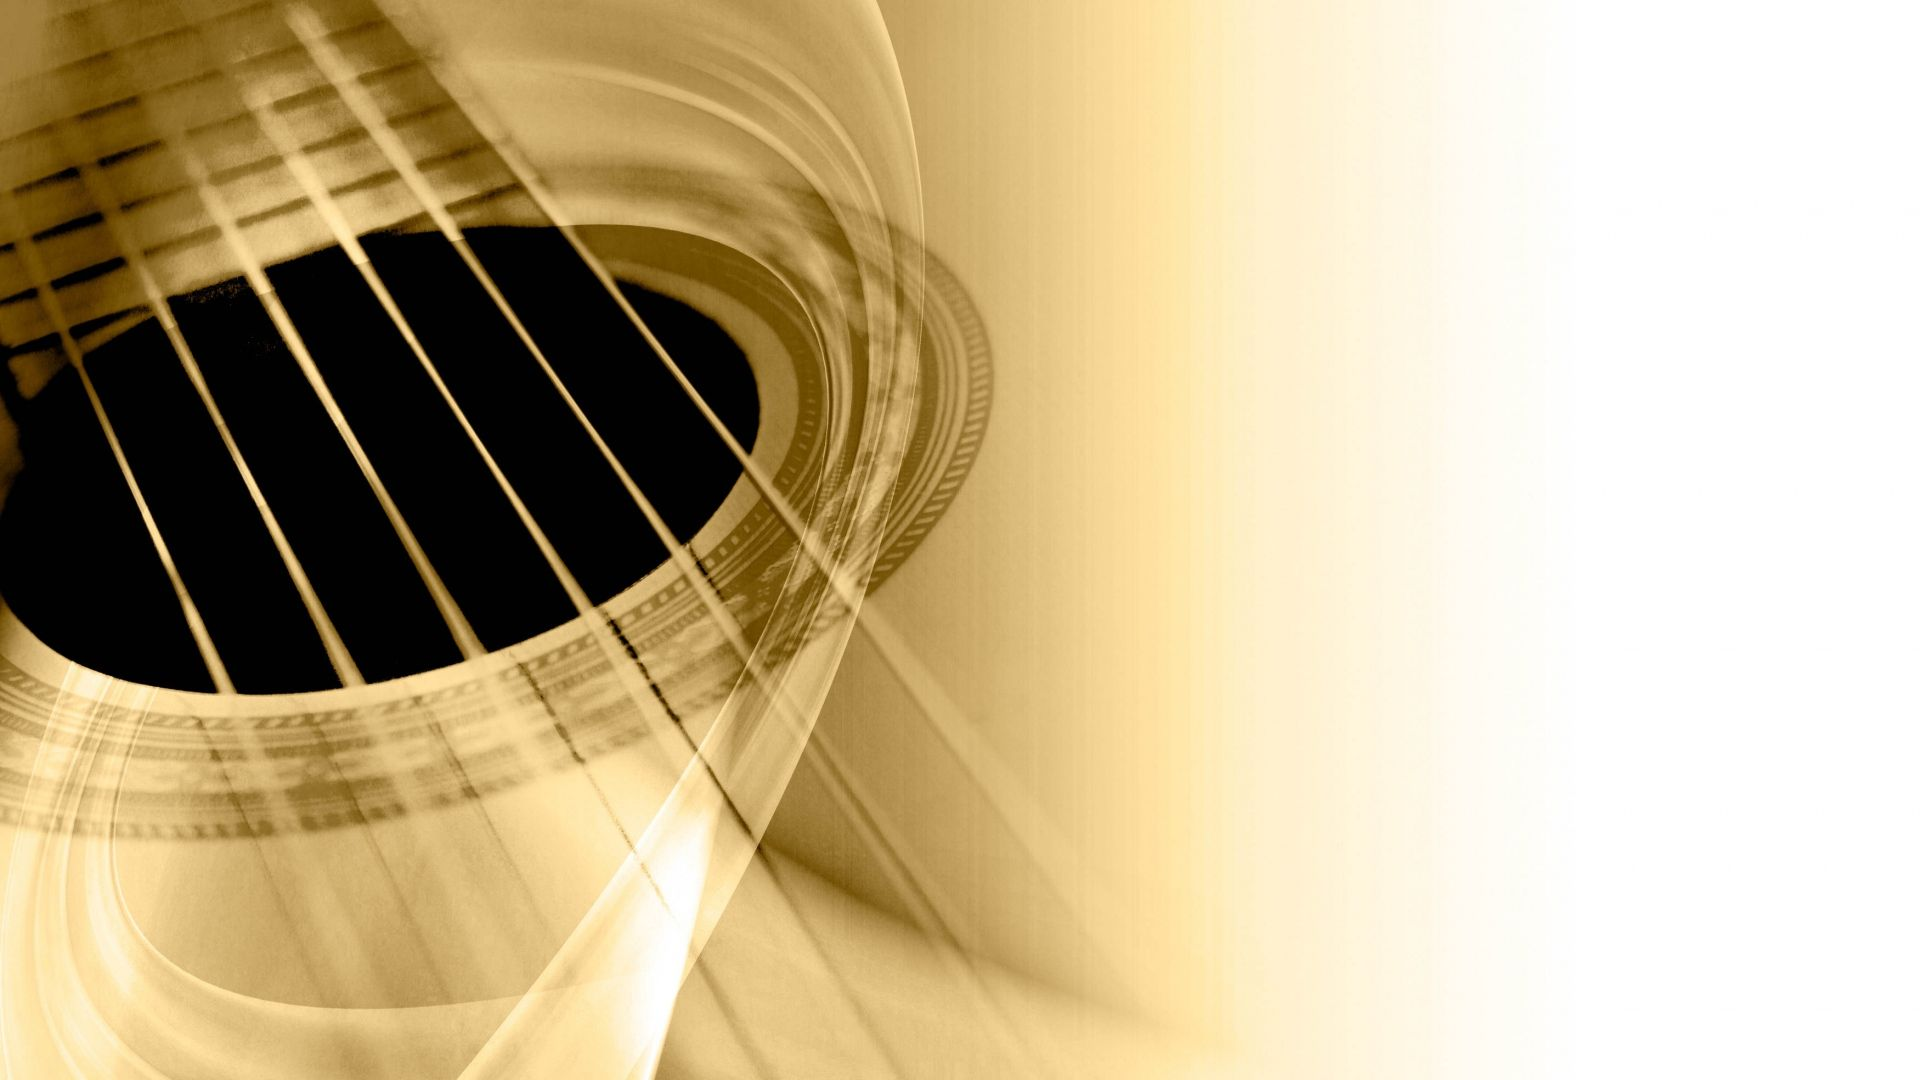 Full HD 1080p Guitar Wallpapers HD Desktop Backgrounds 1920x1080 1920x1080